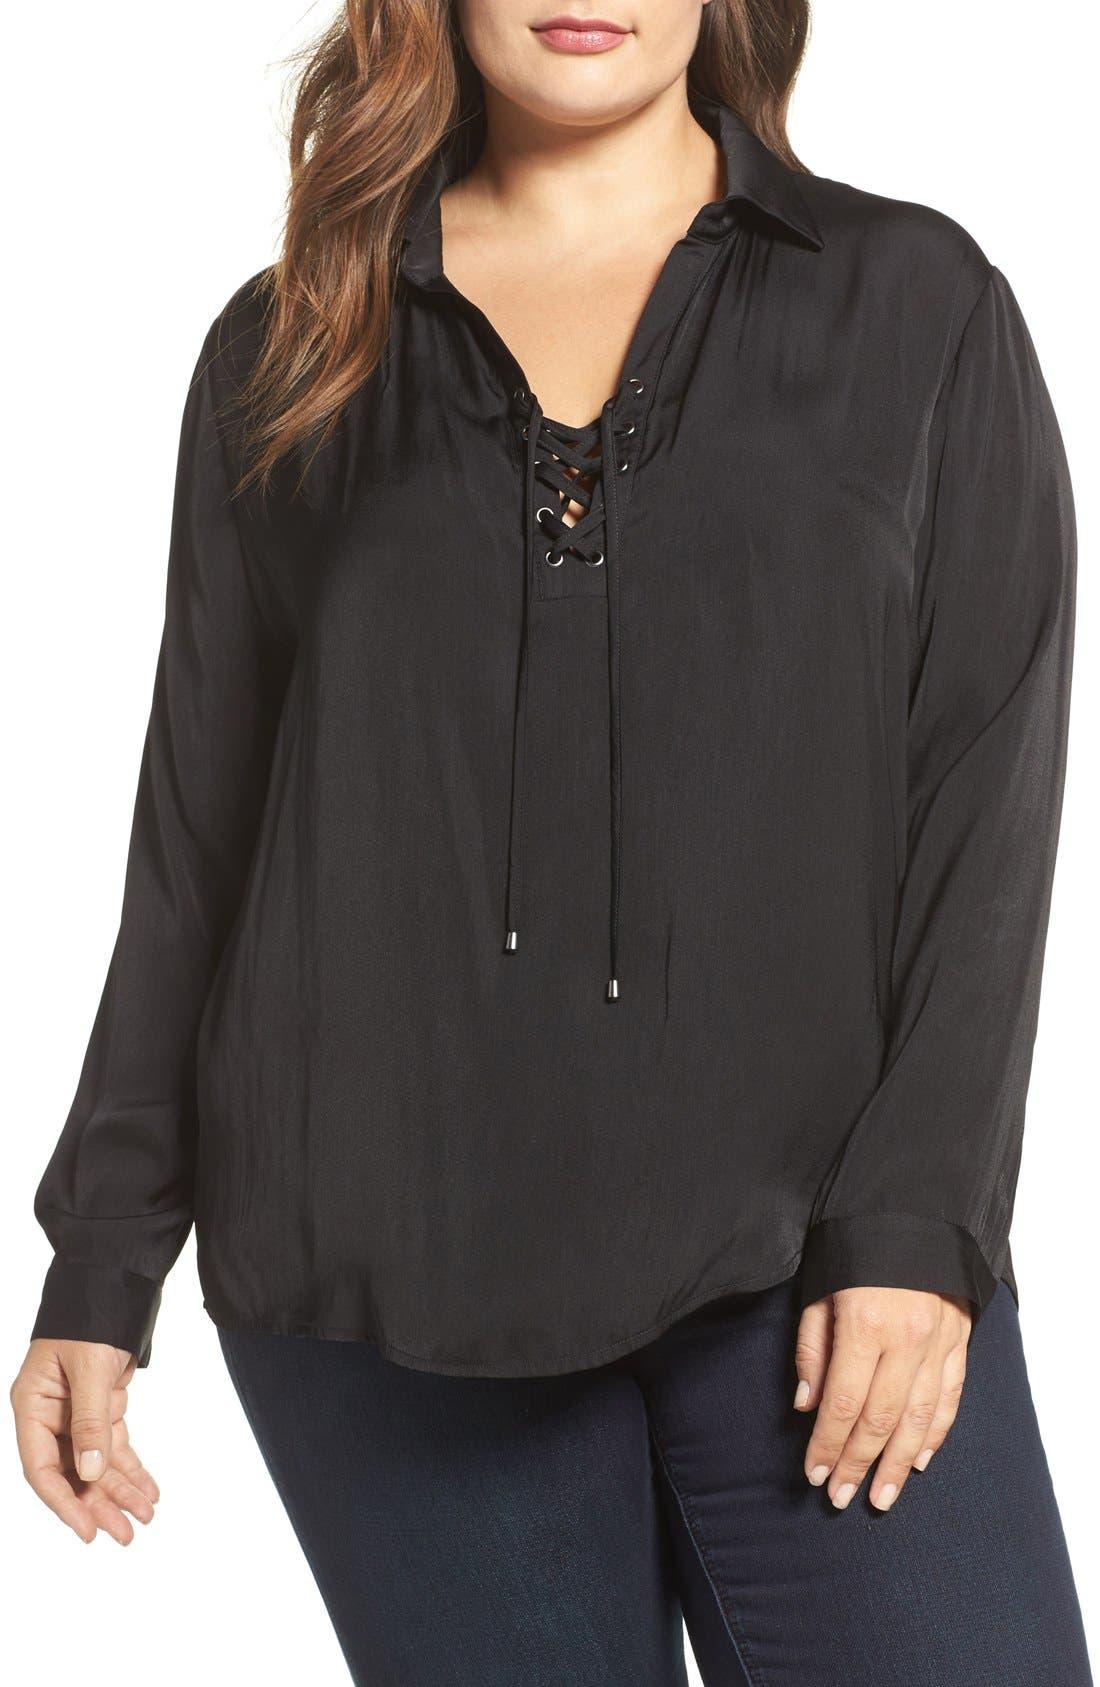 Tart Georgia Lace-Up Blouse (Plus Size)